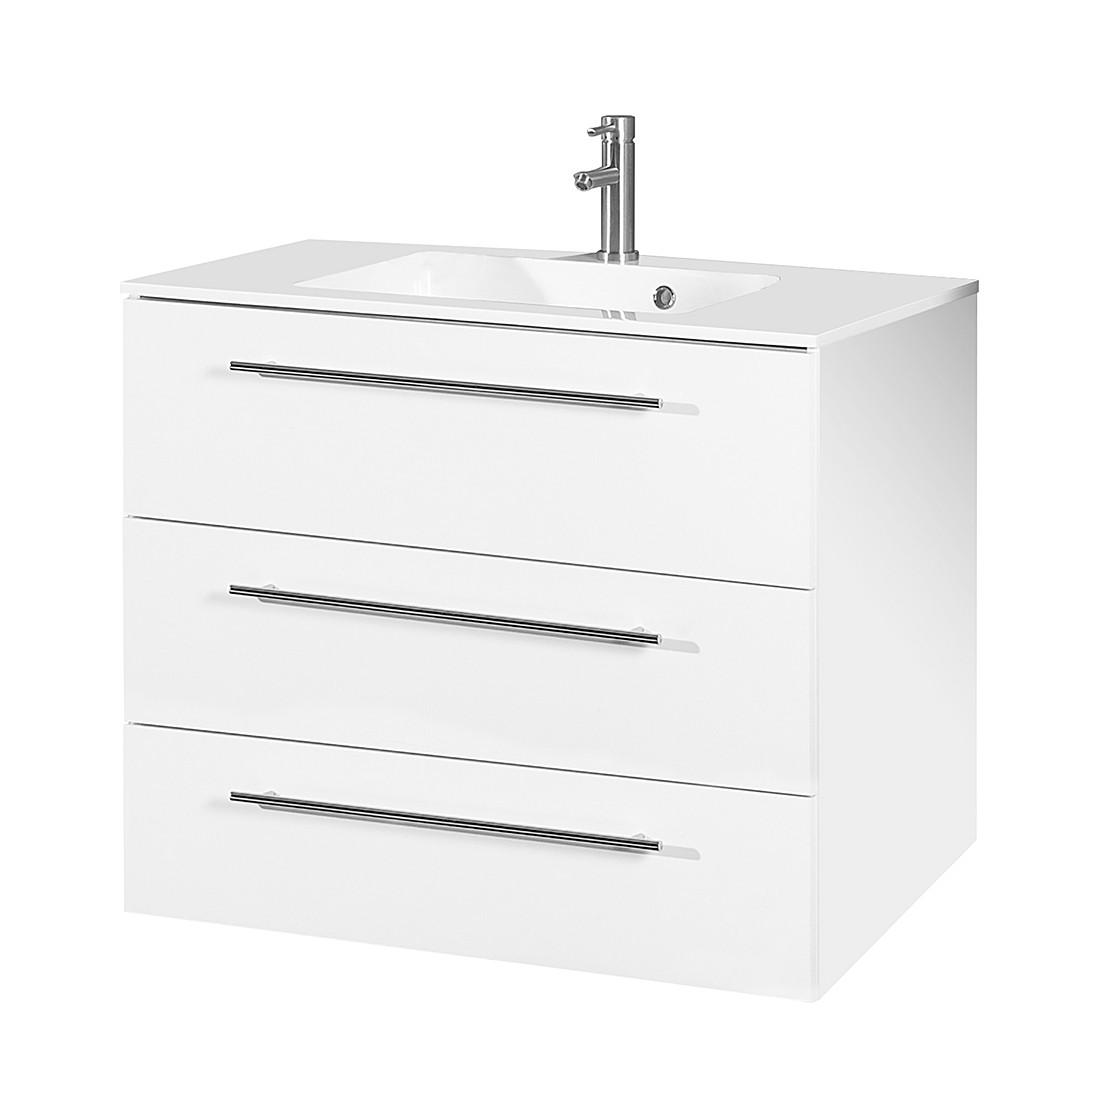 Home 24 - Meuble lavabo bern iv - blanc, schildmeyer